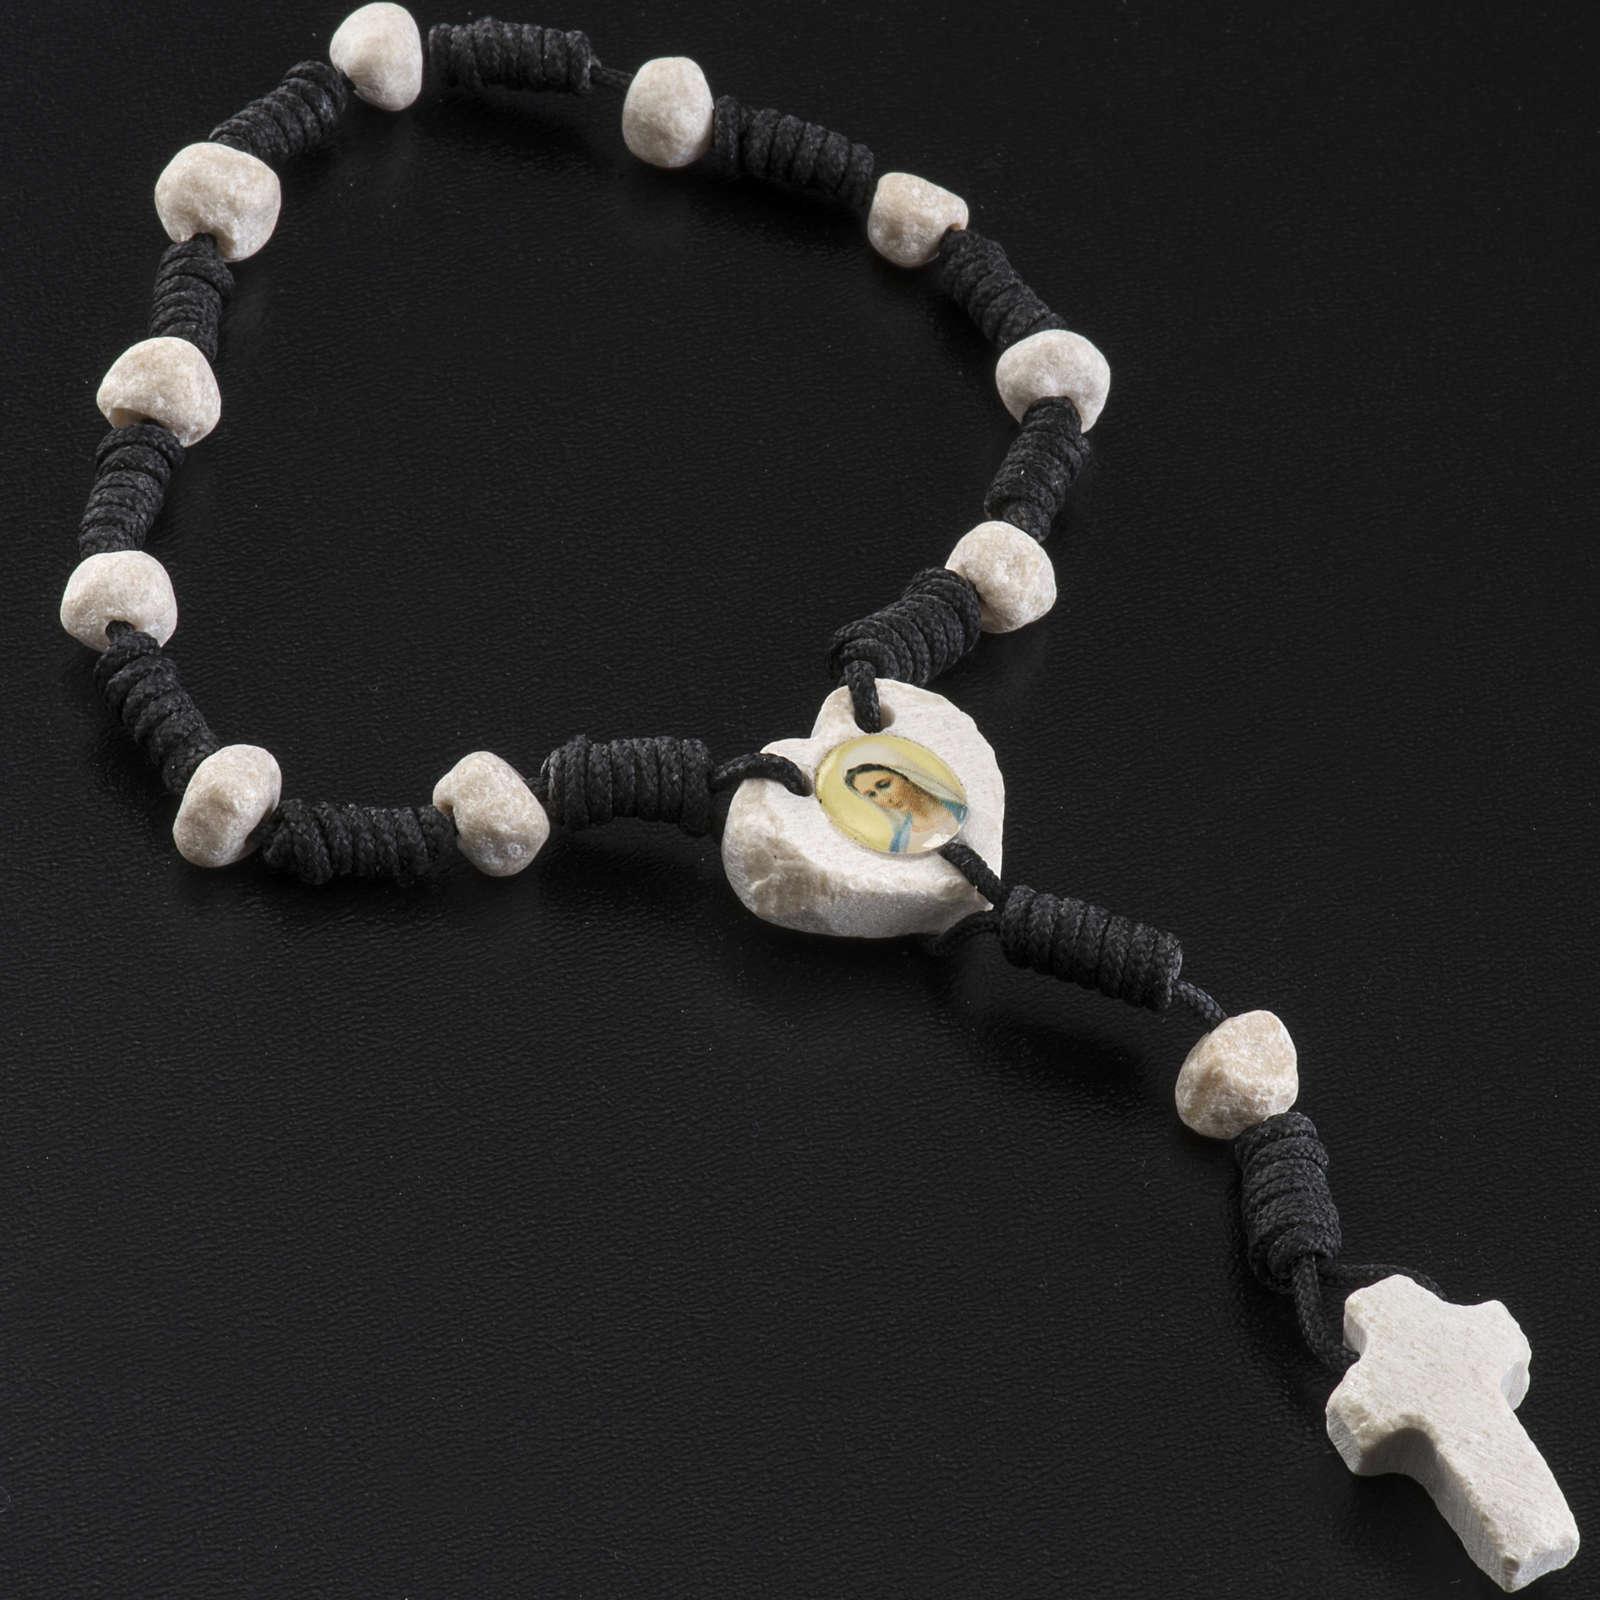 Coronilla Medjugorje piedra cuerda negra corazón 4